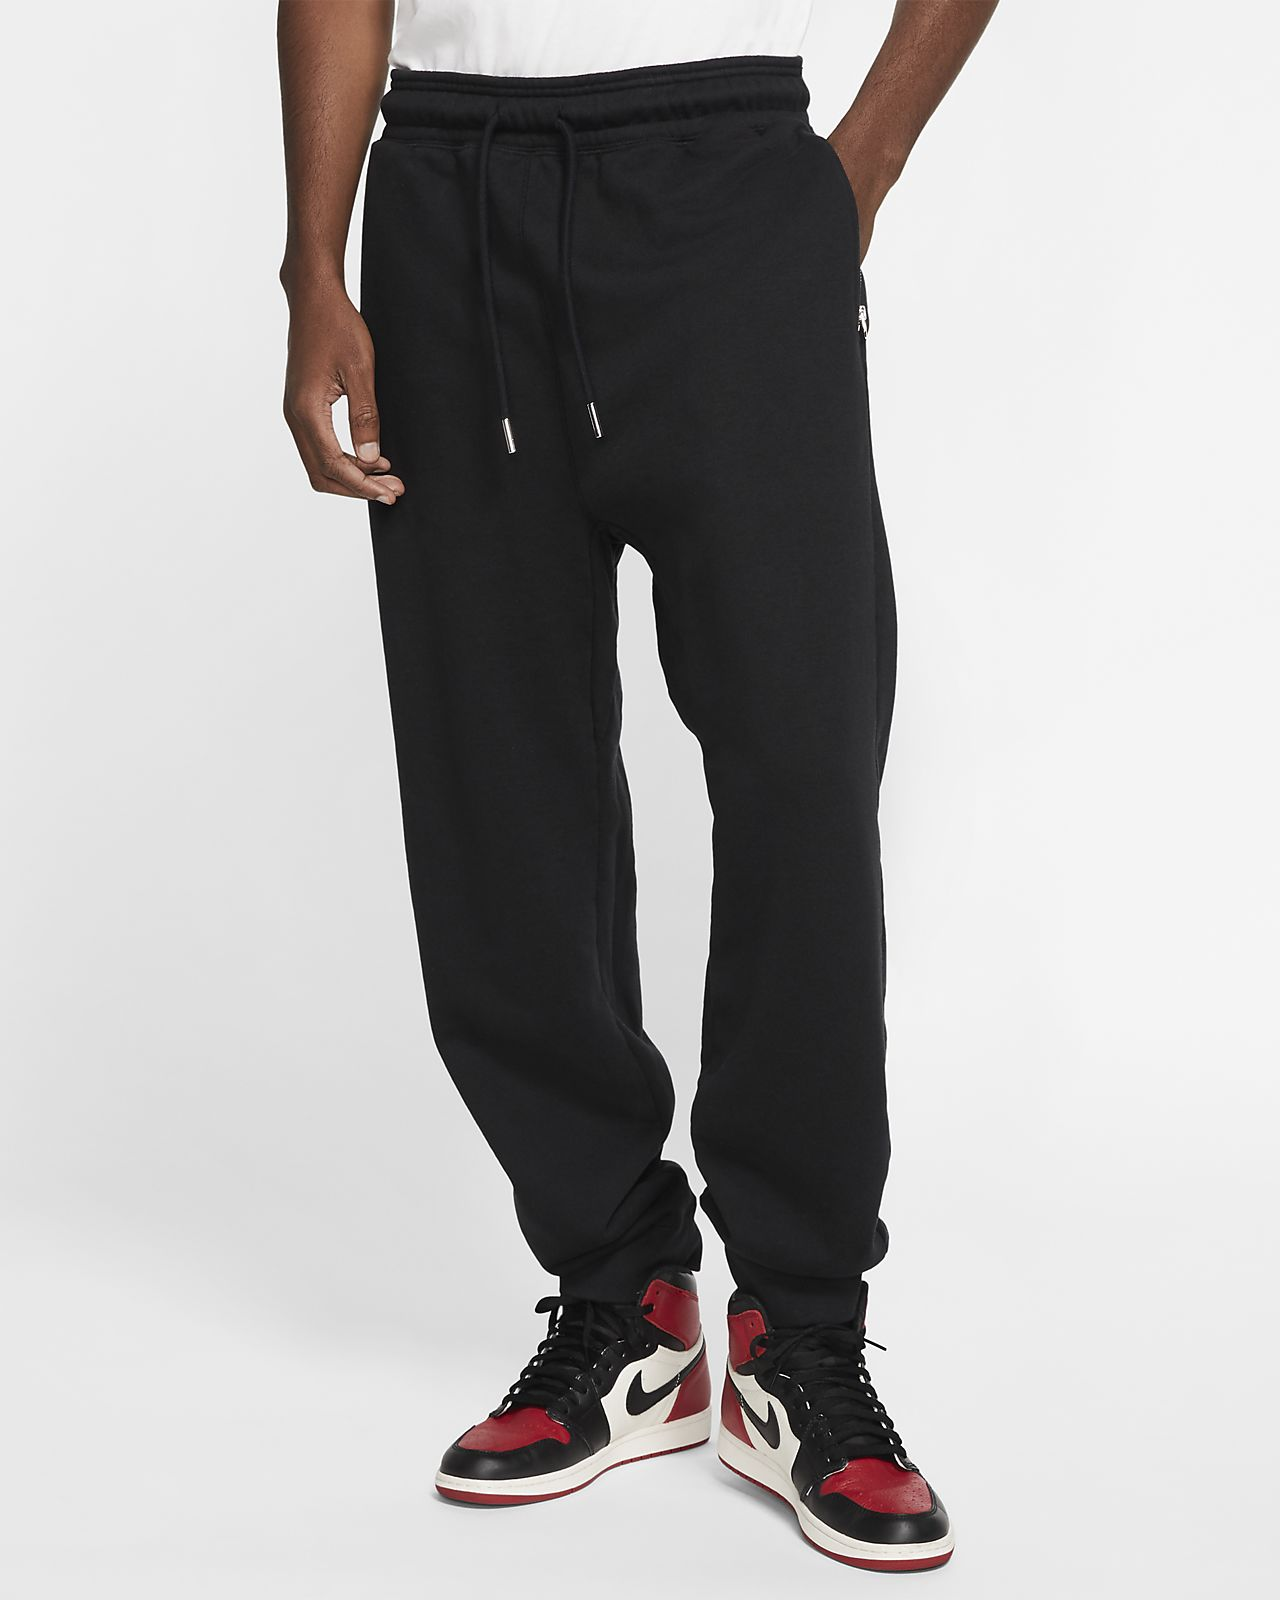 Jordan Black Cat Fleece Trousers